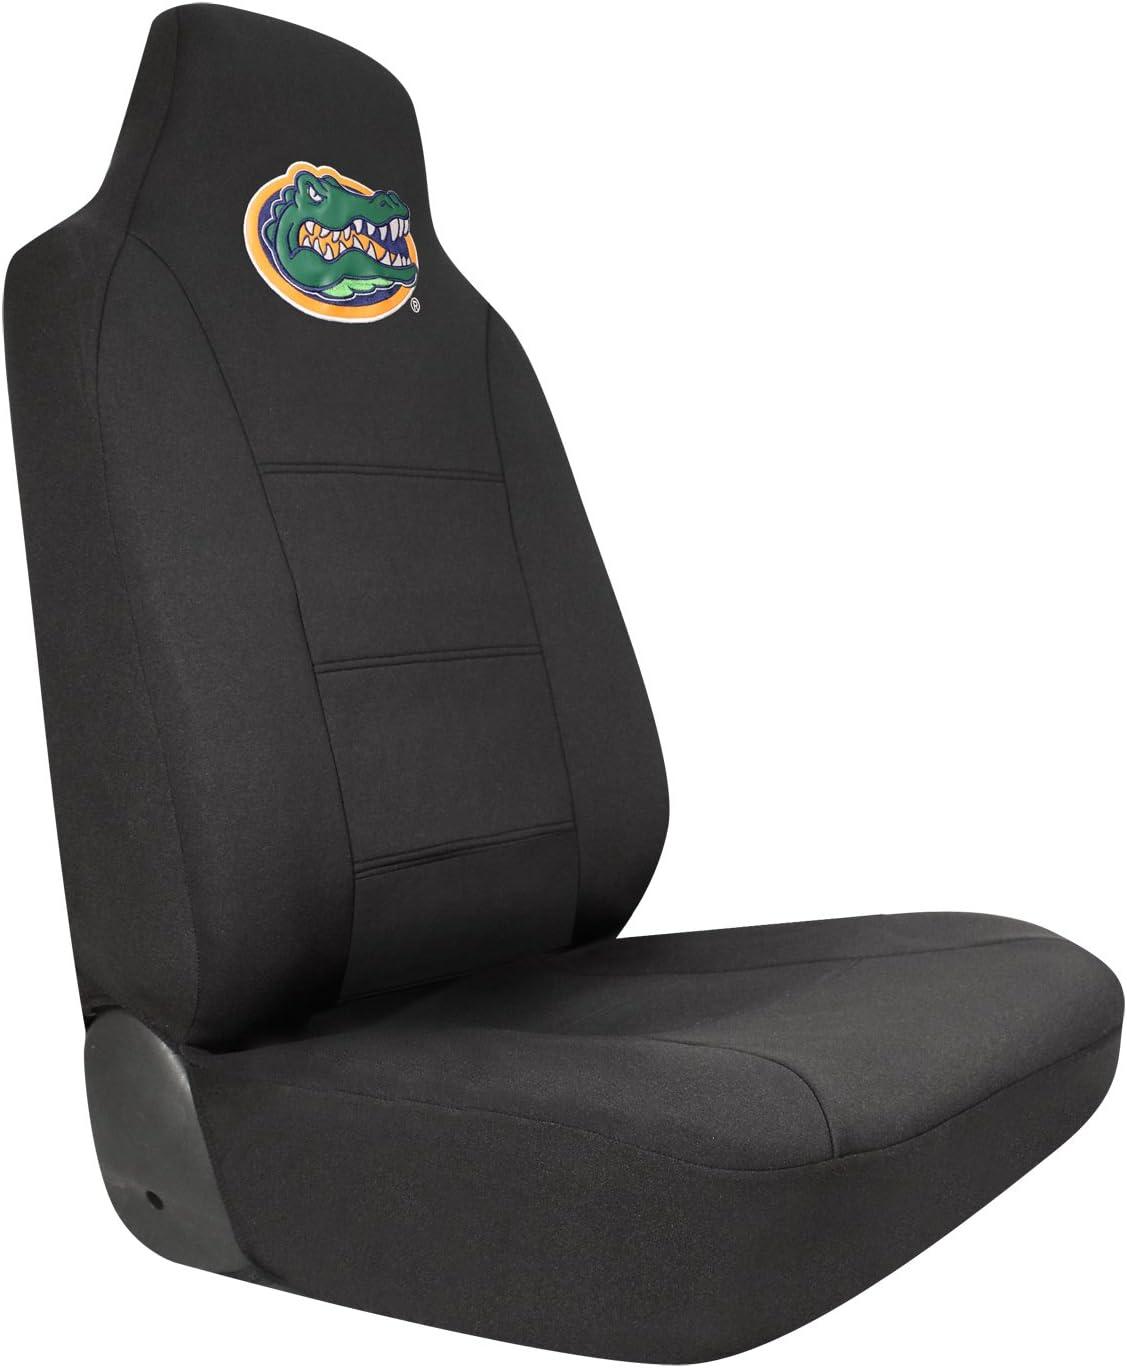 Collegiate Boise State Broncos Pilot Alumni Group SC-988 Black Seat Cover with Logo